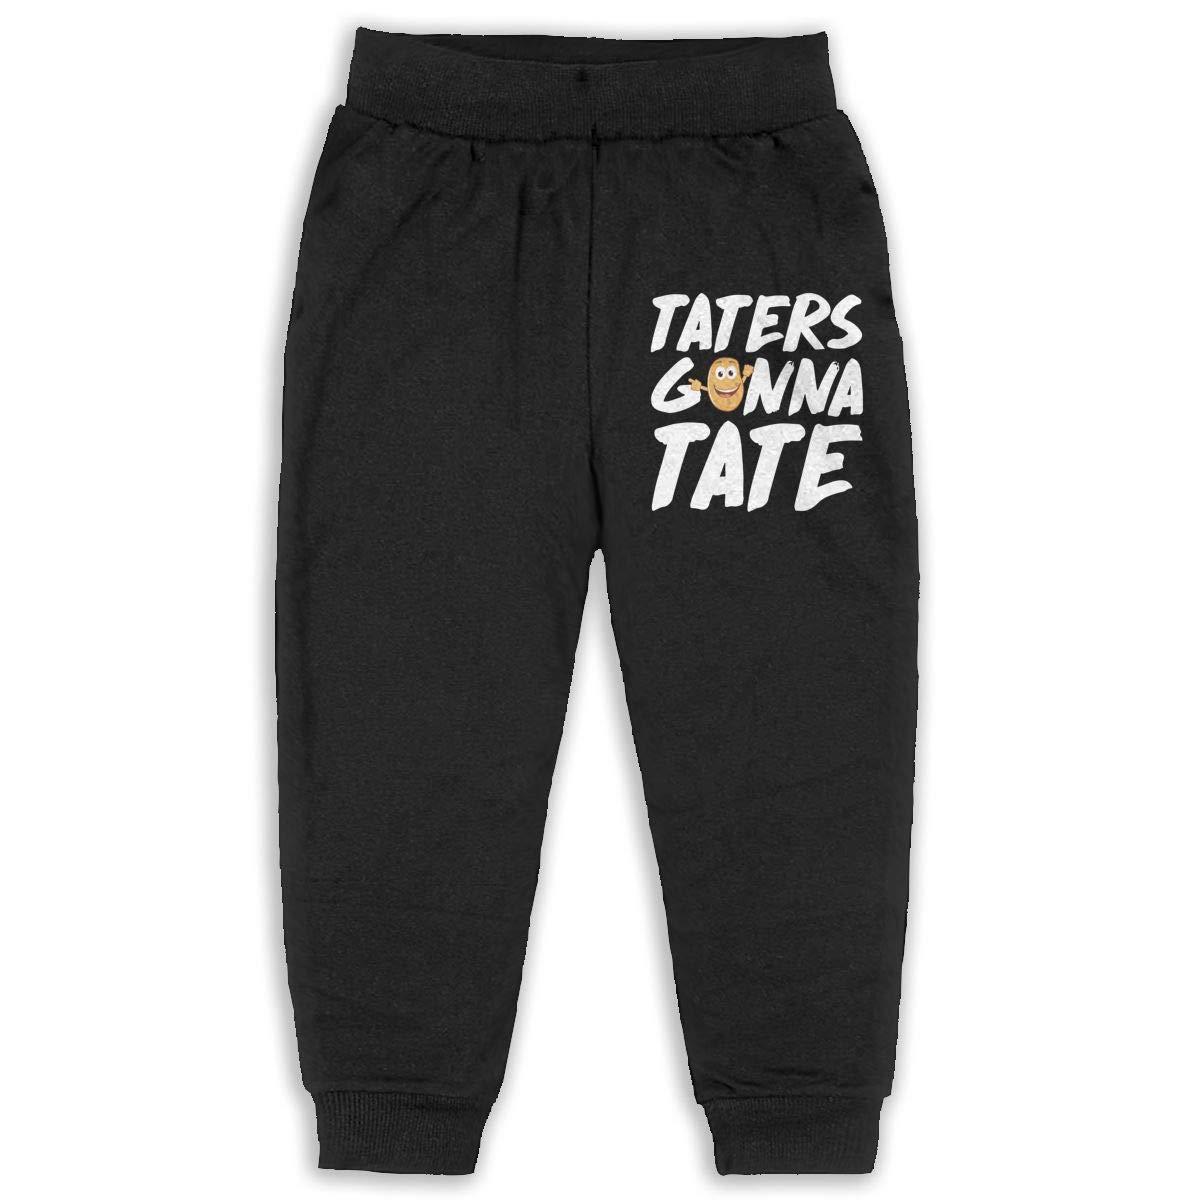 Laoyaotequ Taters Gonna Taste Funny Potato Kids Cotton Sweatpants,Jogger Long Jersey Sweatpants